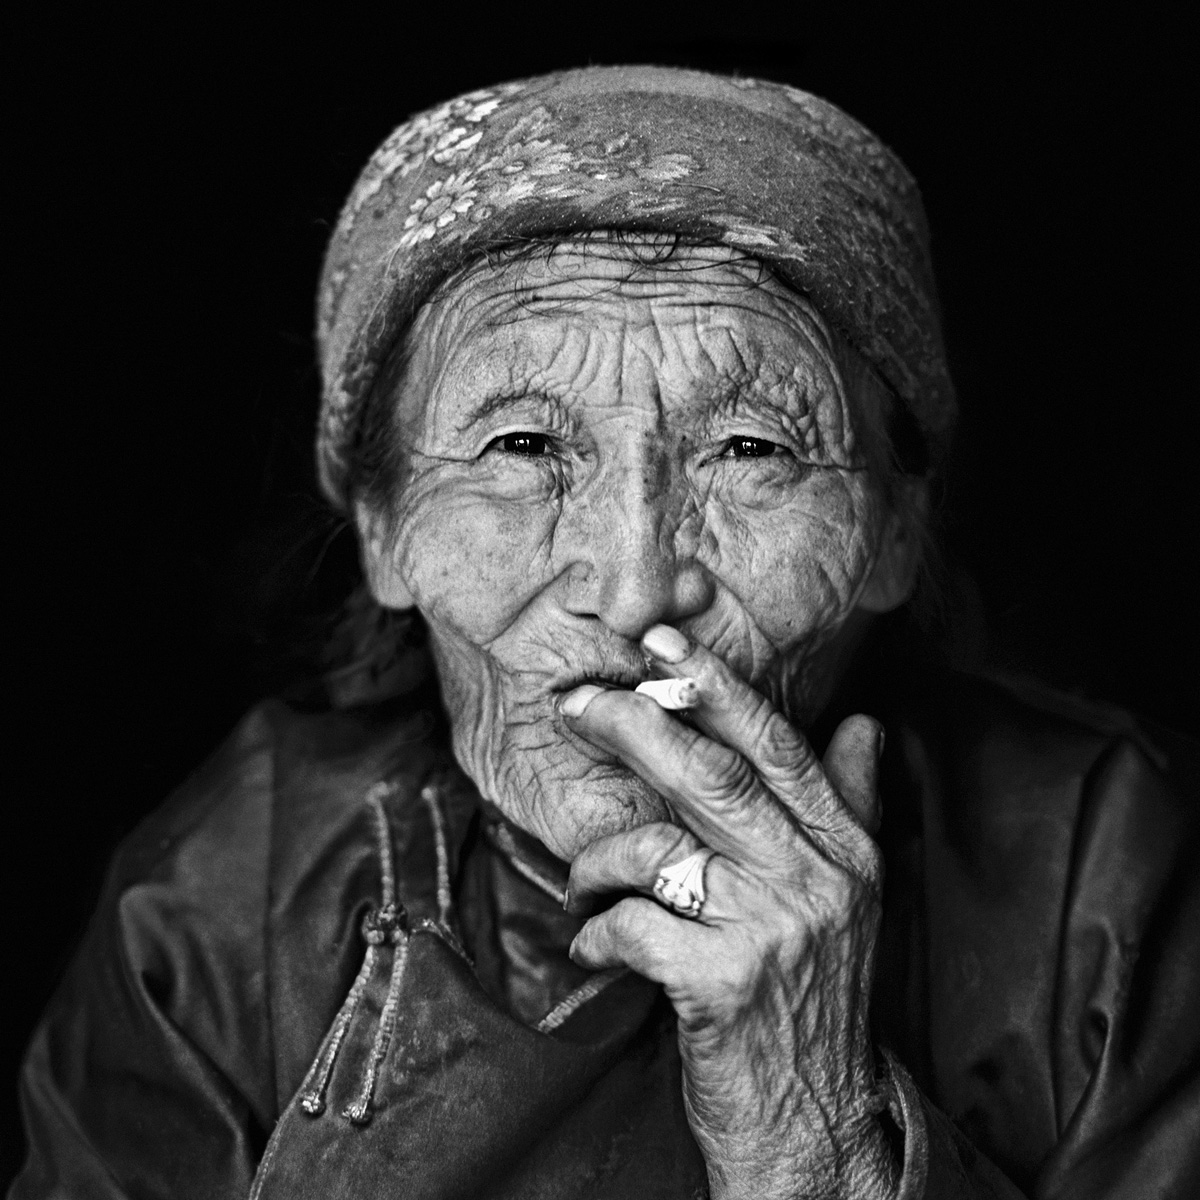 © Christine Turnauer, Presence - Punzel, Mongolia 2013